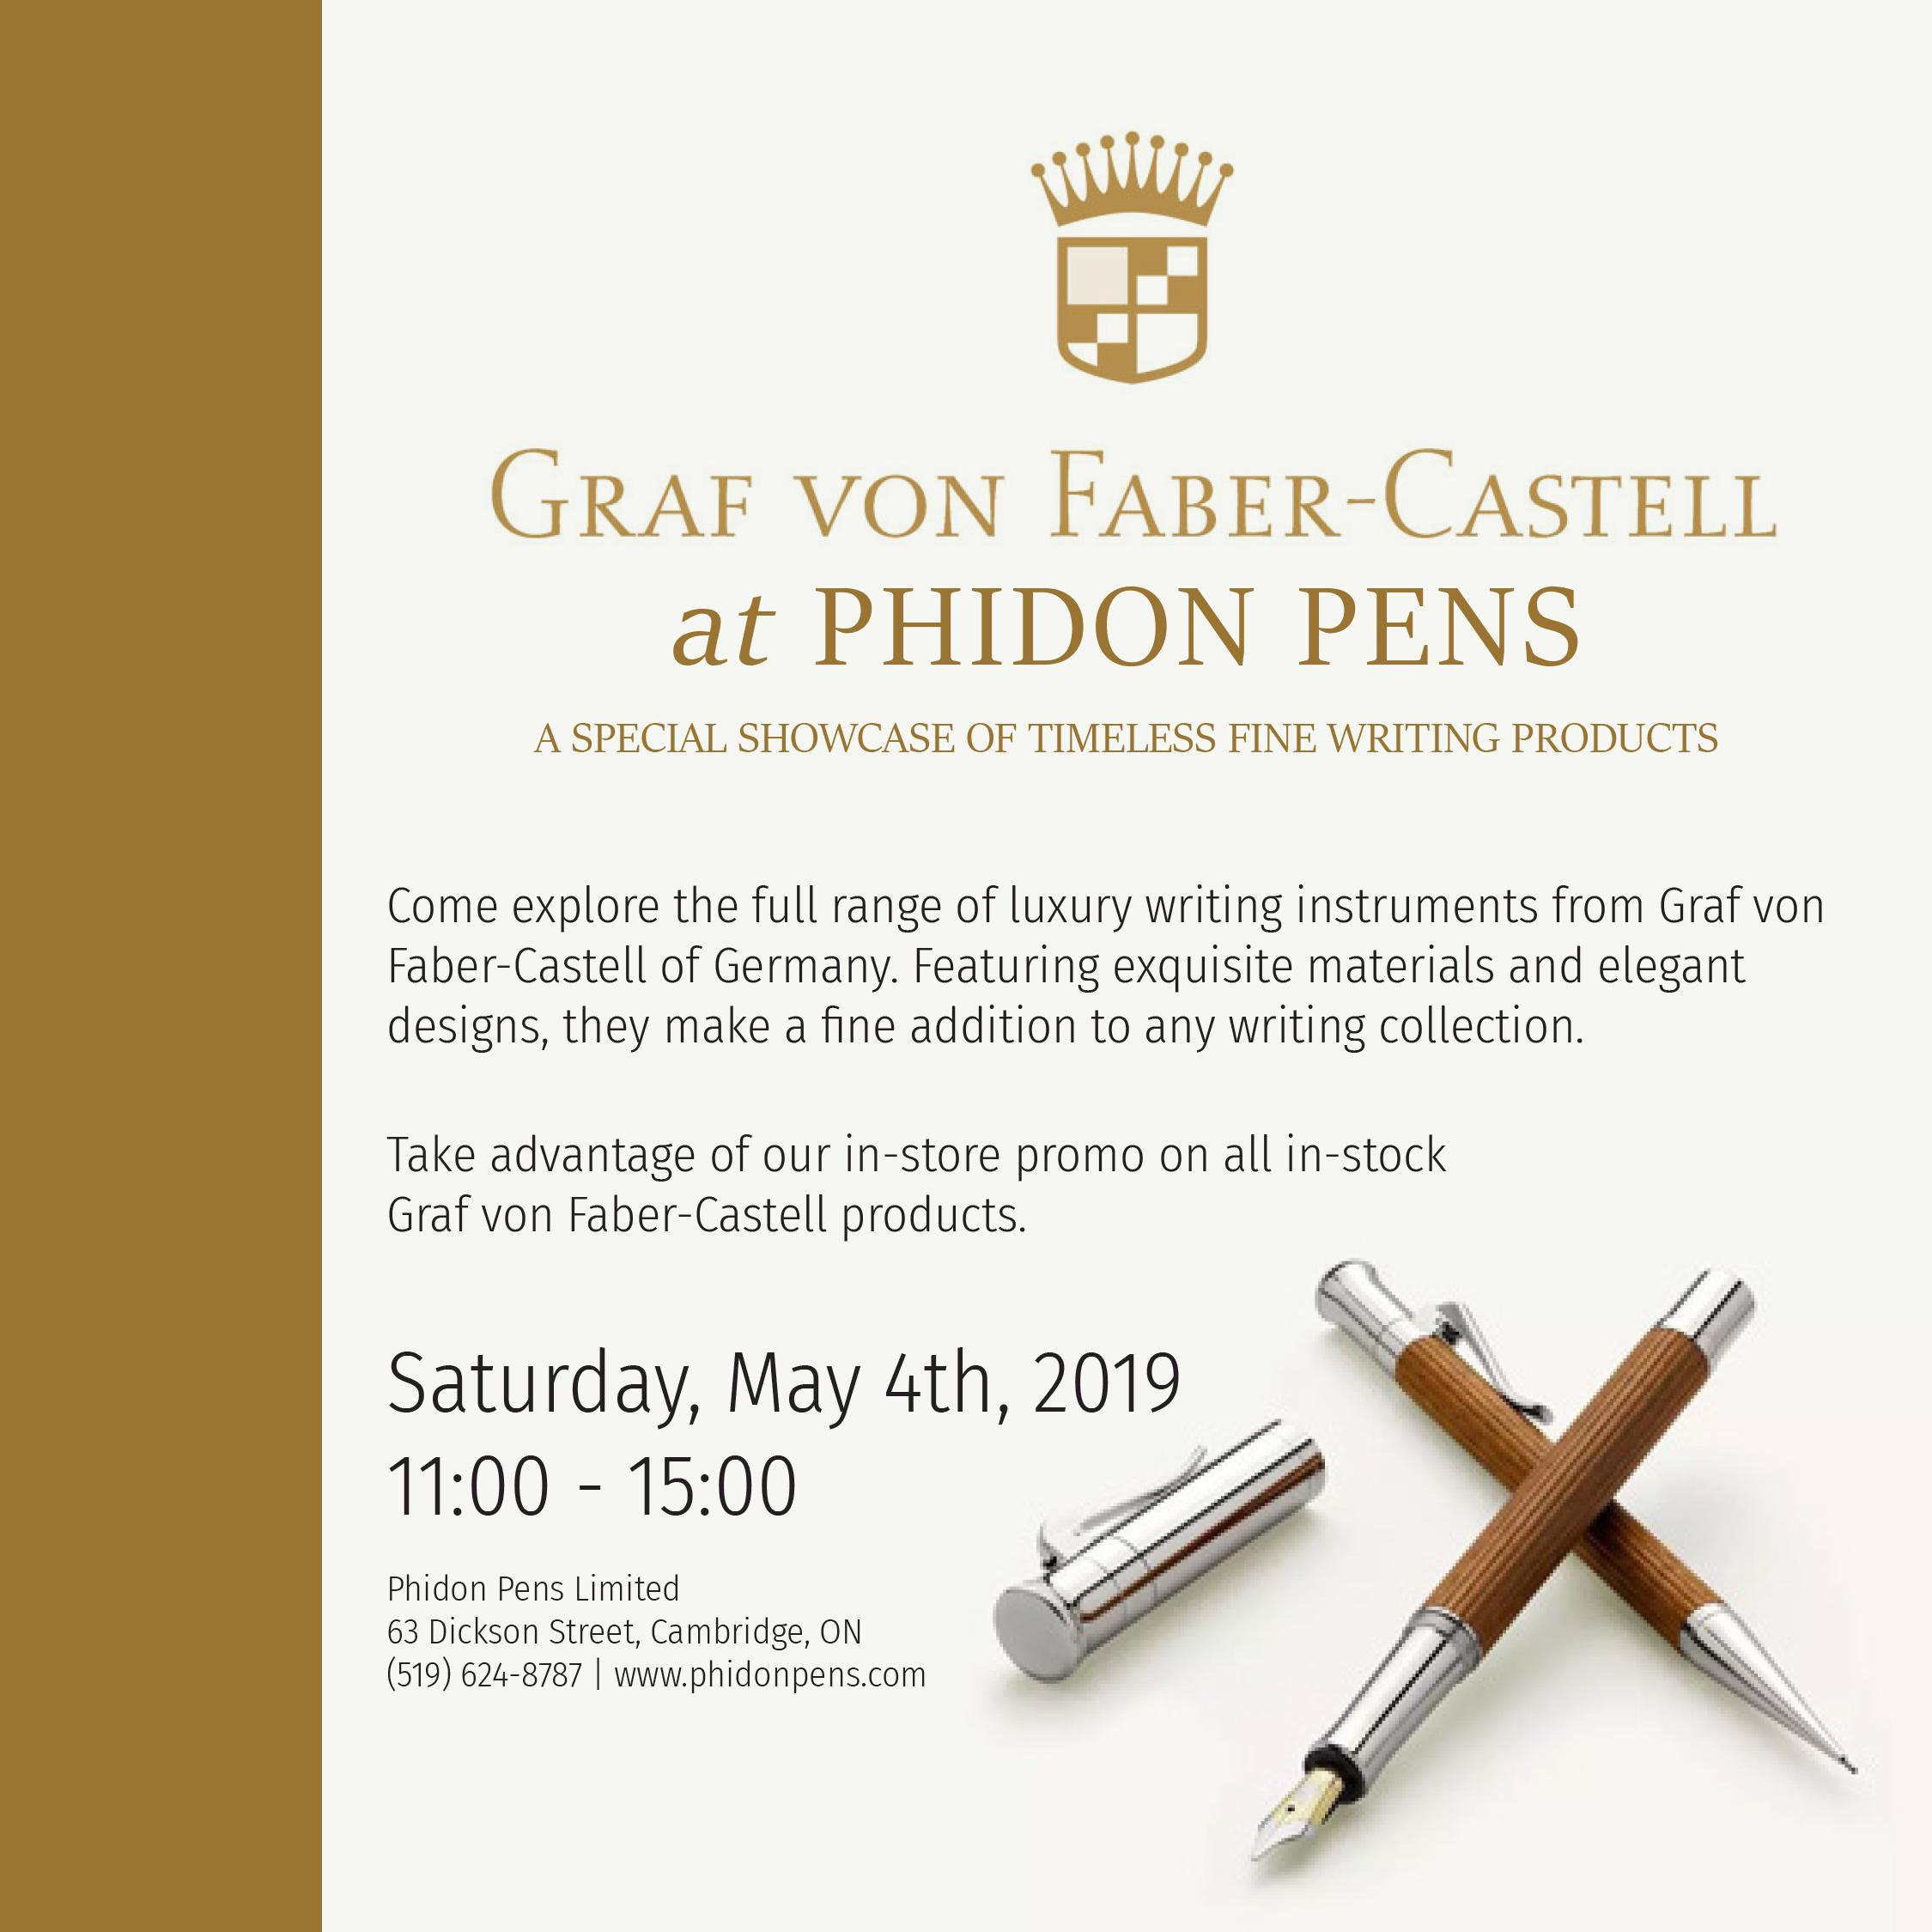 Faber Castell Event Poster-2.jpg